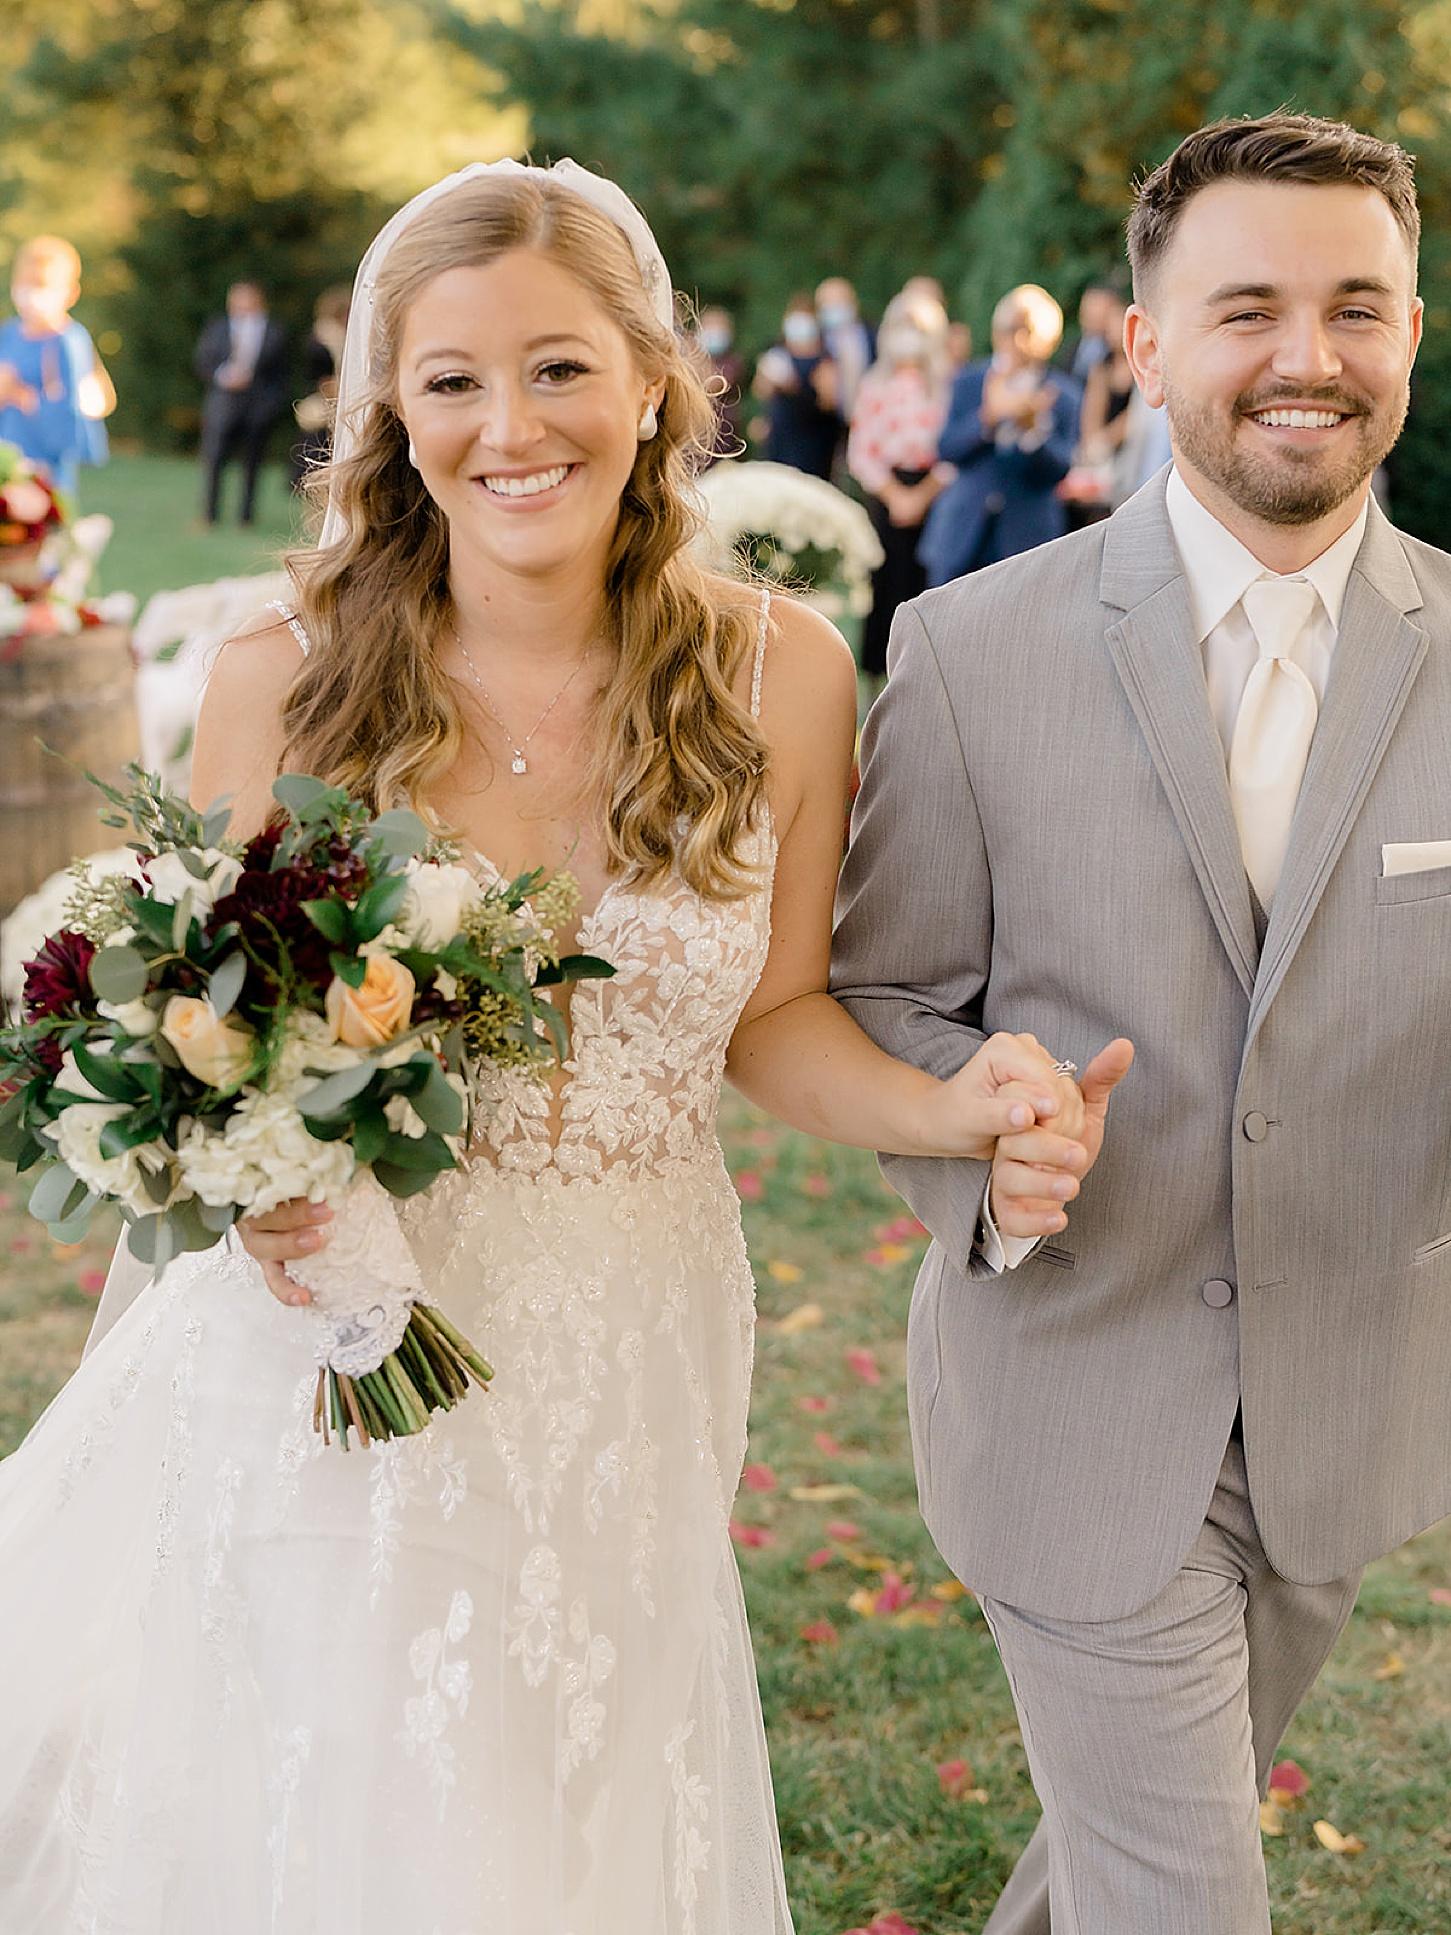 Valenzano Winery Vitners Pavillion Wedding Photography by Magdalena Studios 0025